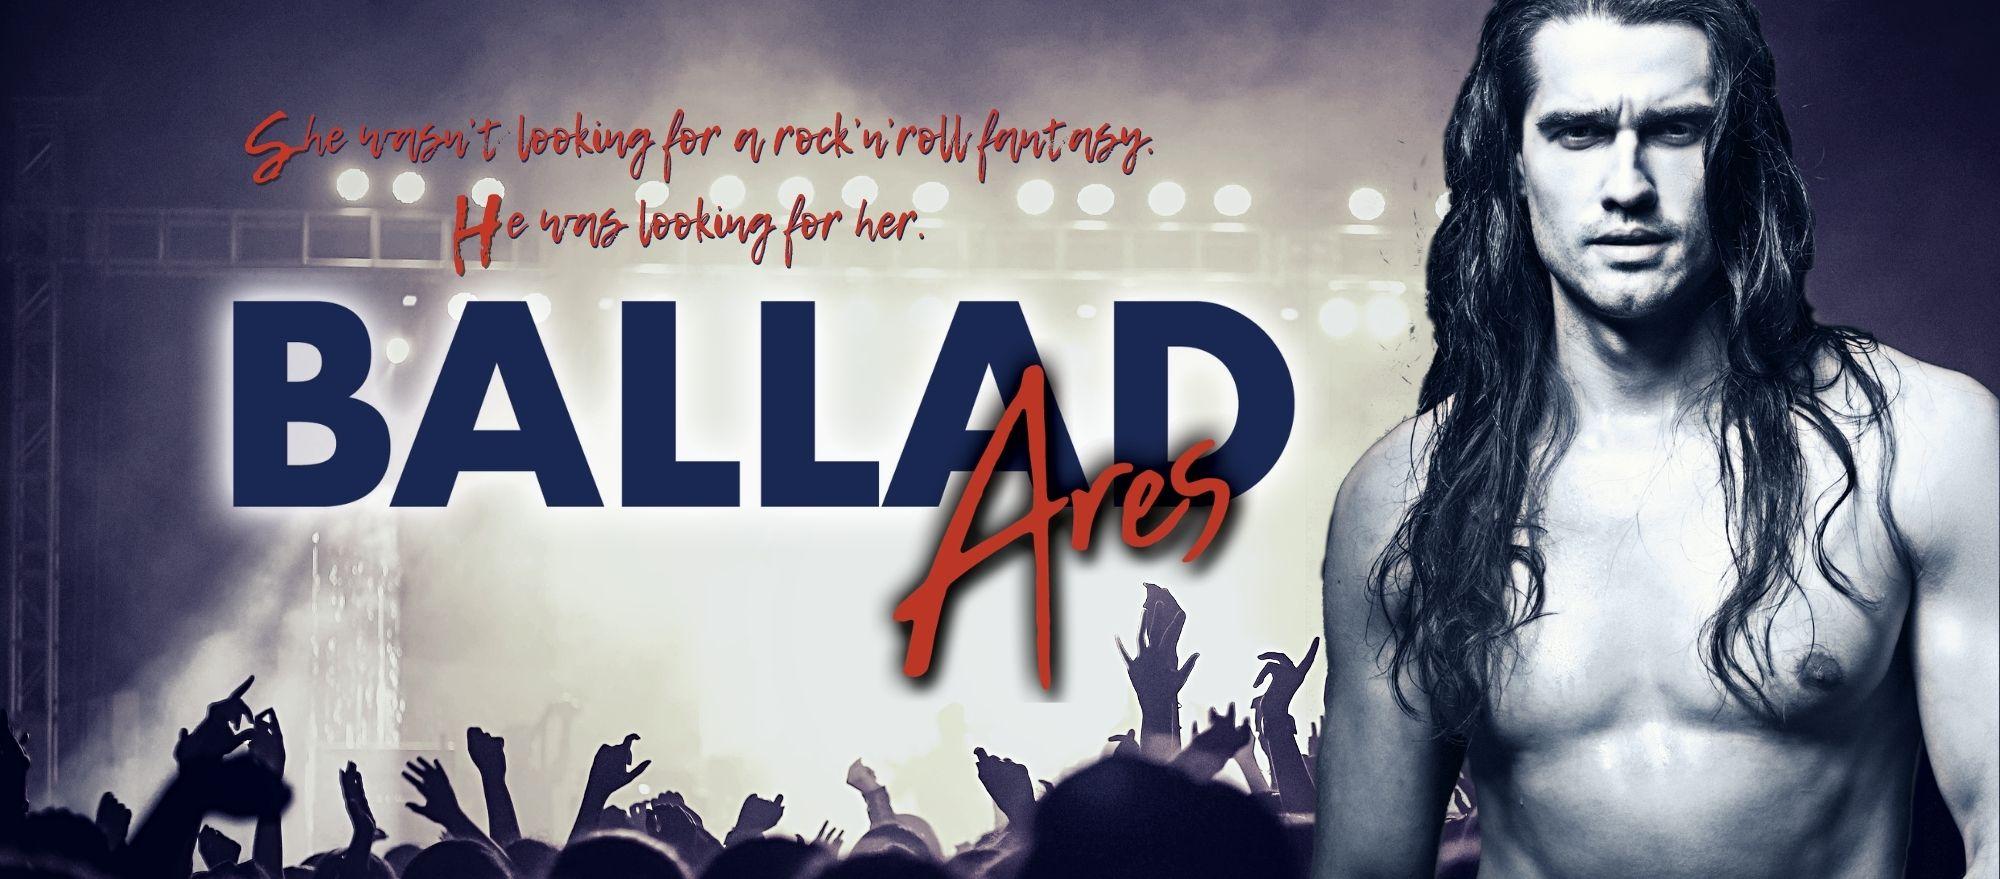 Ballad facebook banner